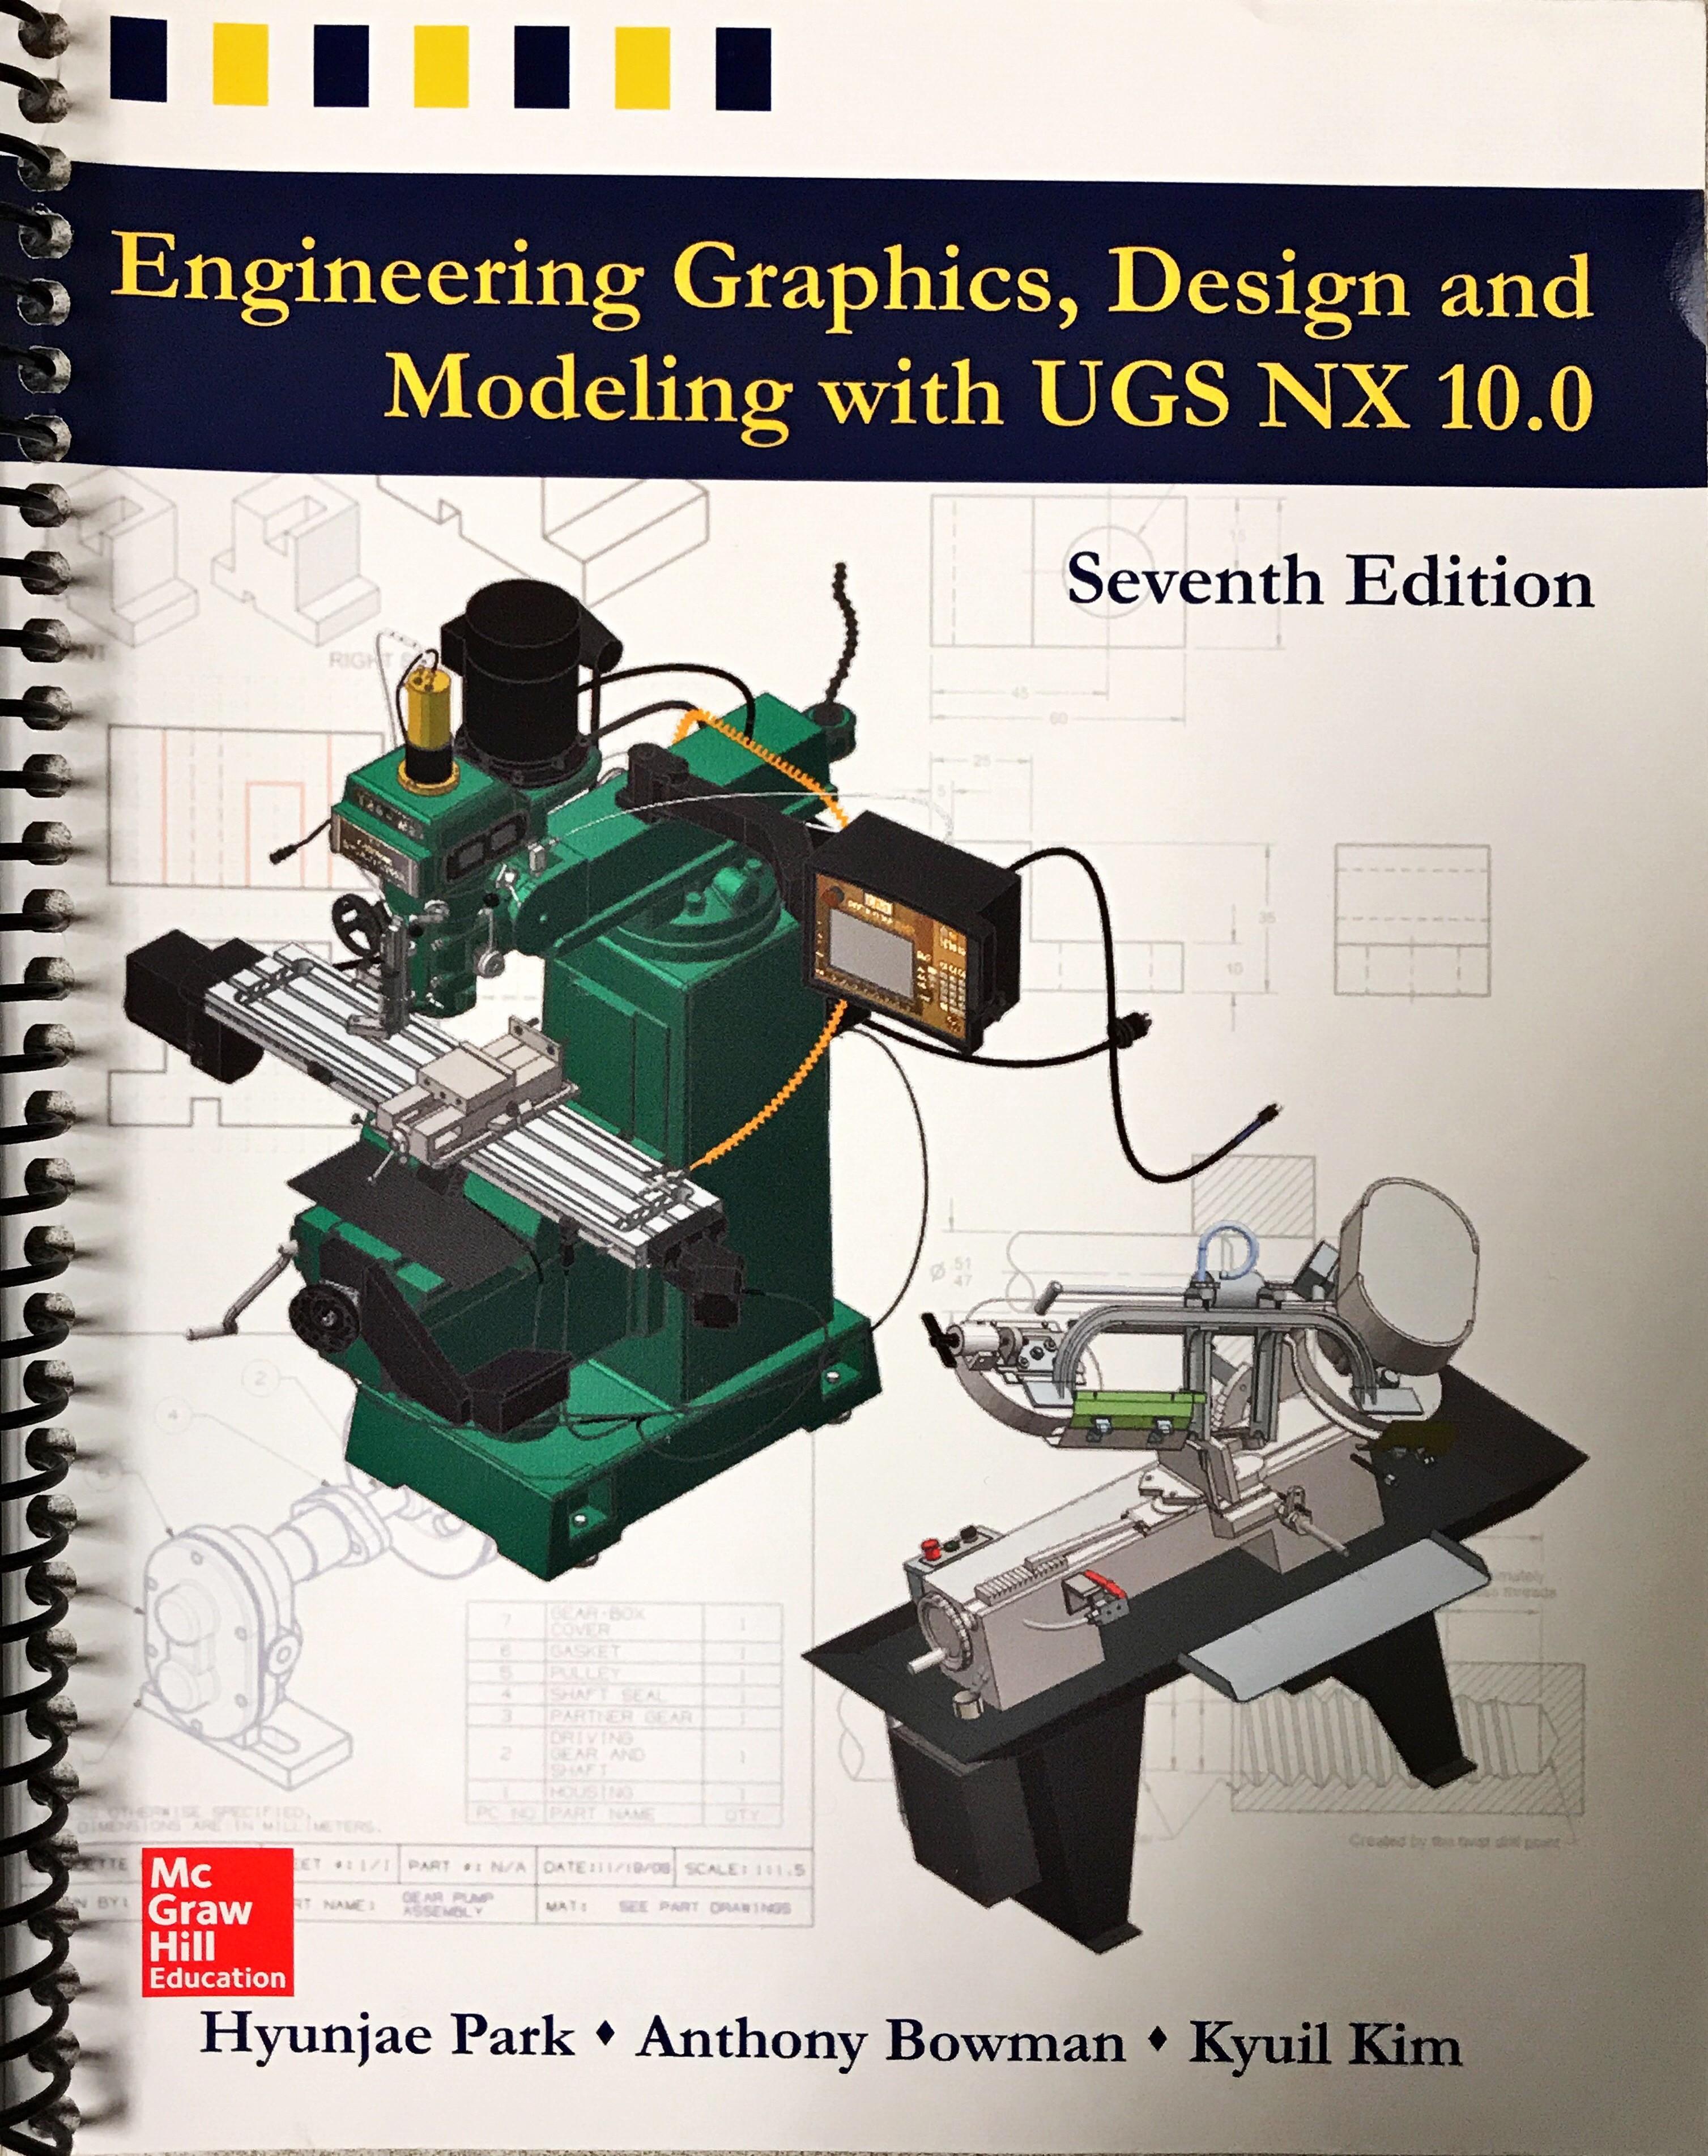 engineering graphics.jpg